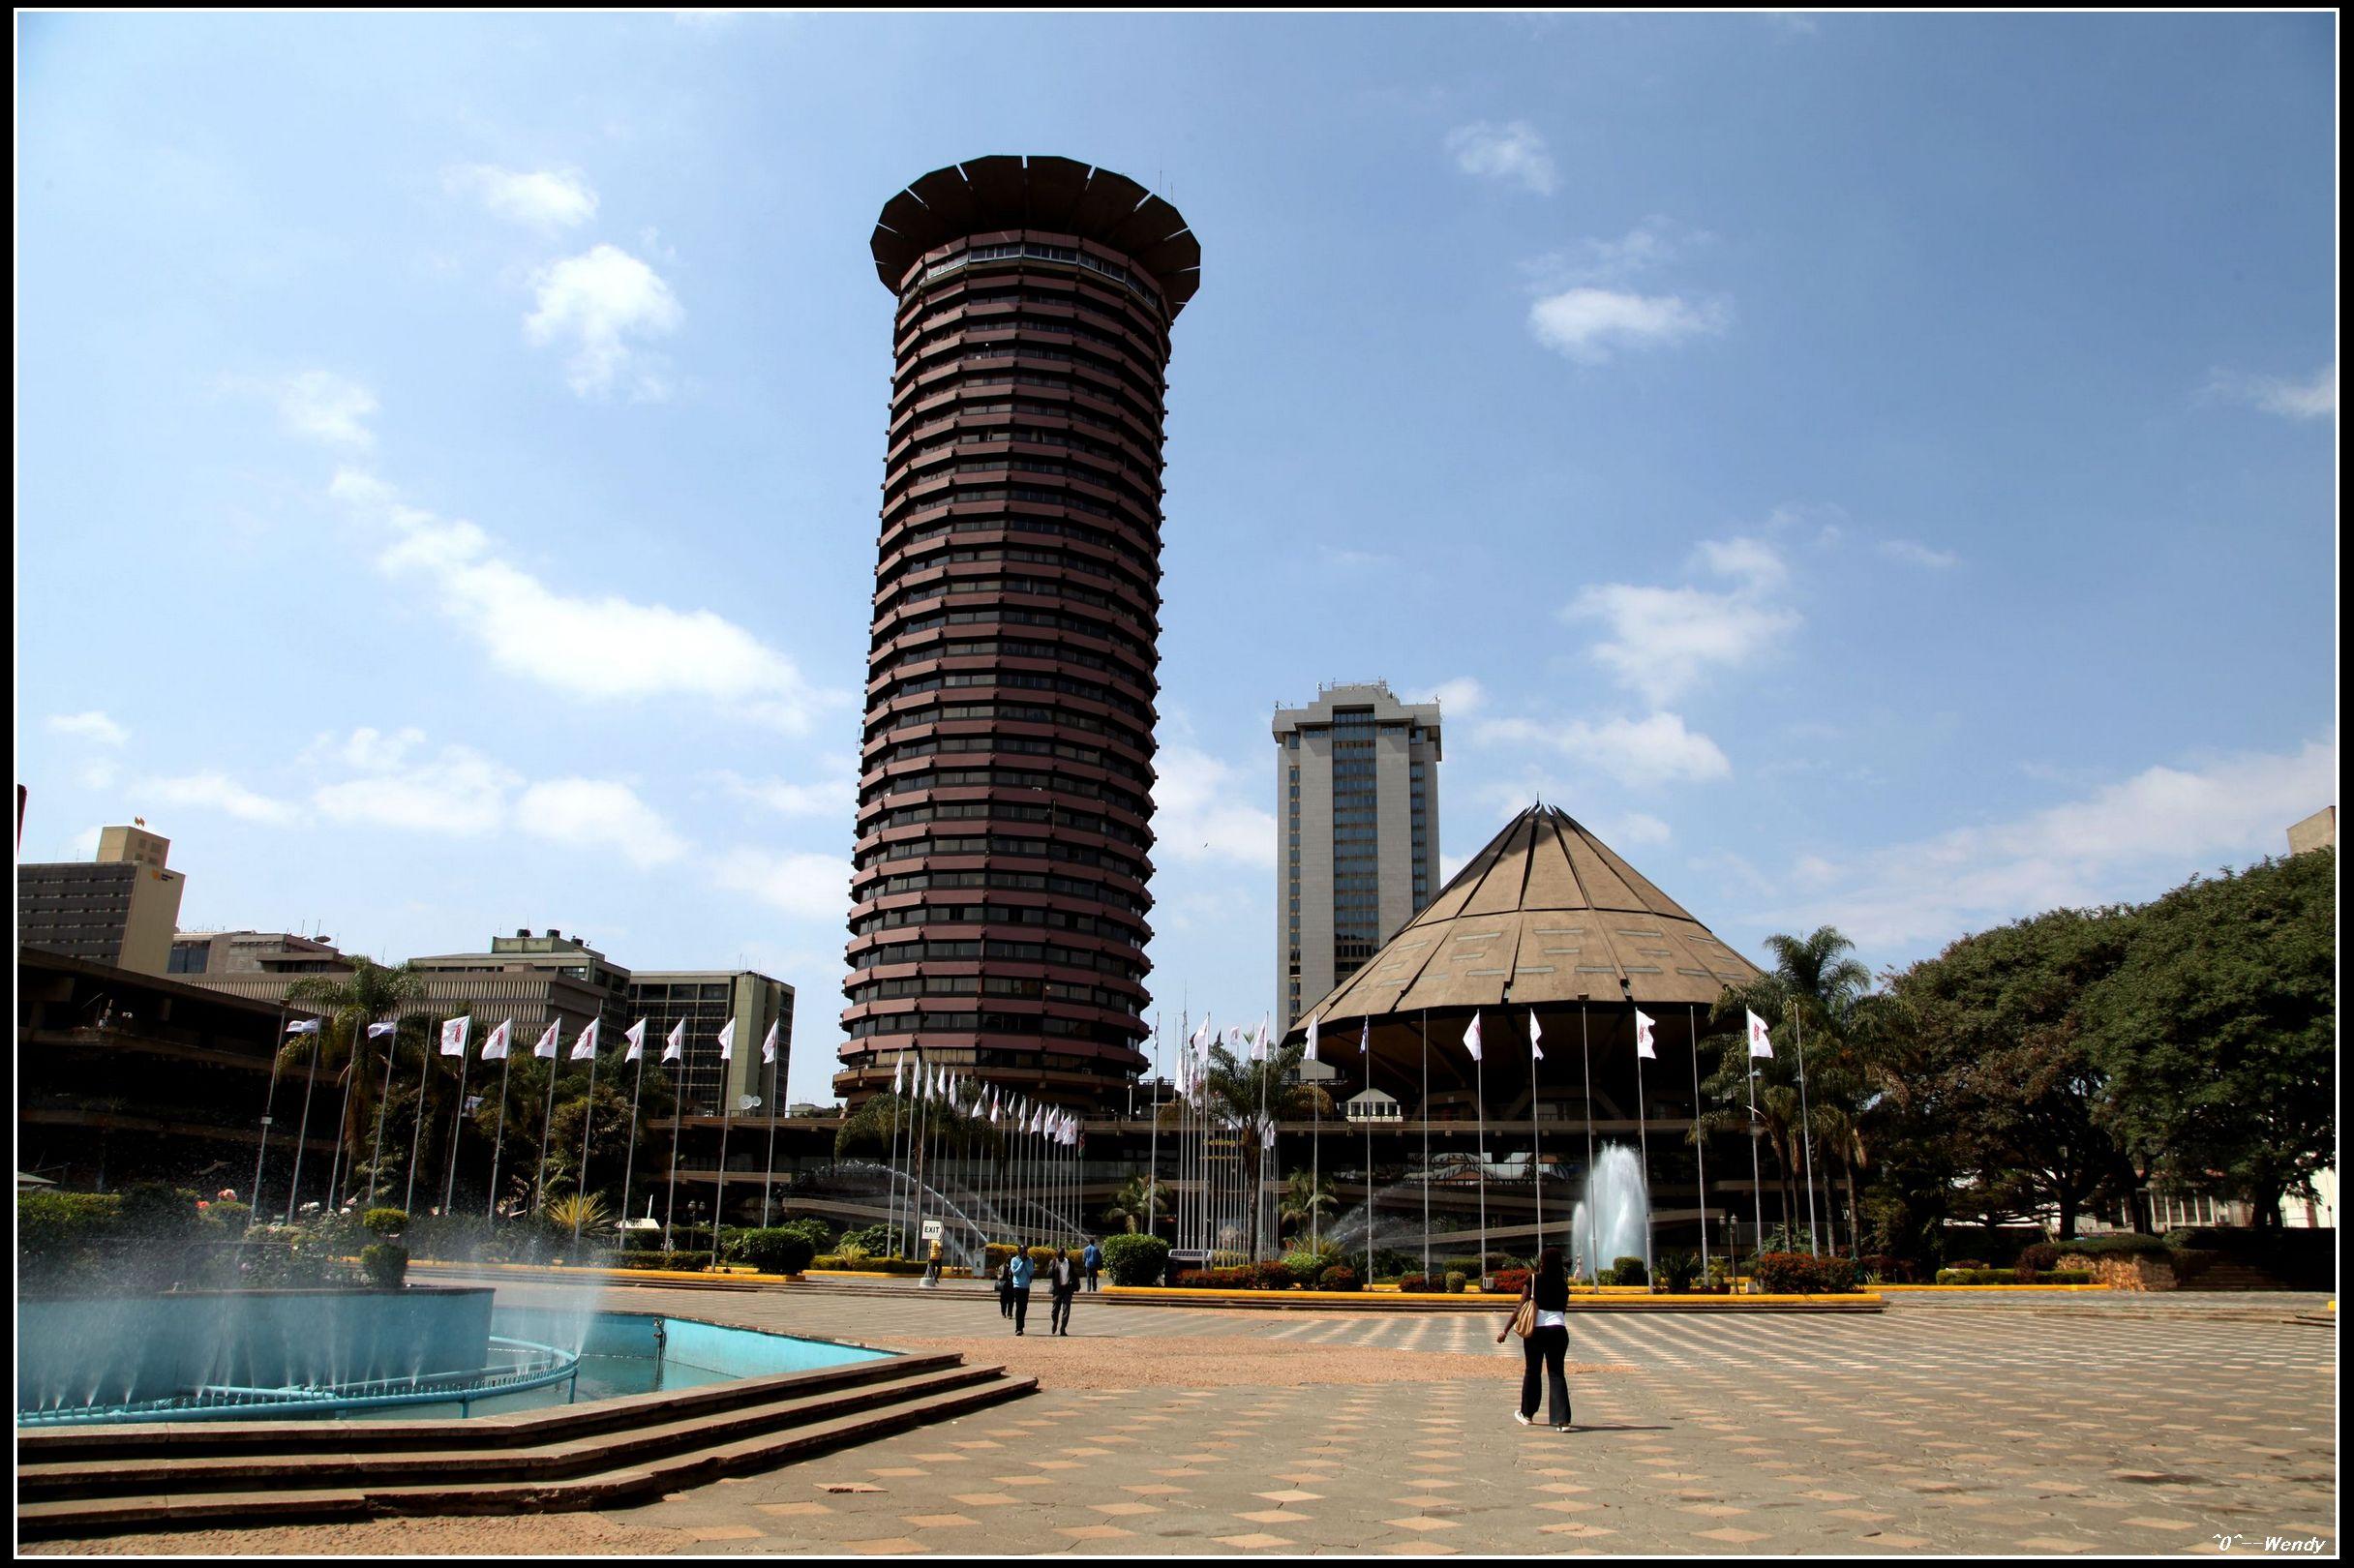 肯雅塔国际会议中心  Kenyatta International Conference Centre   -0